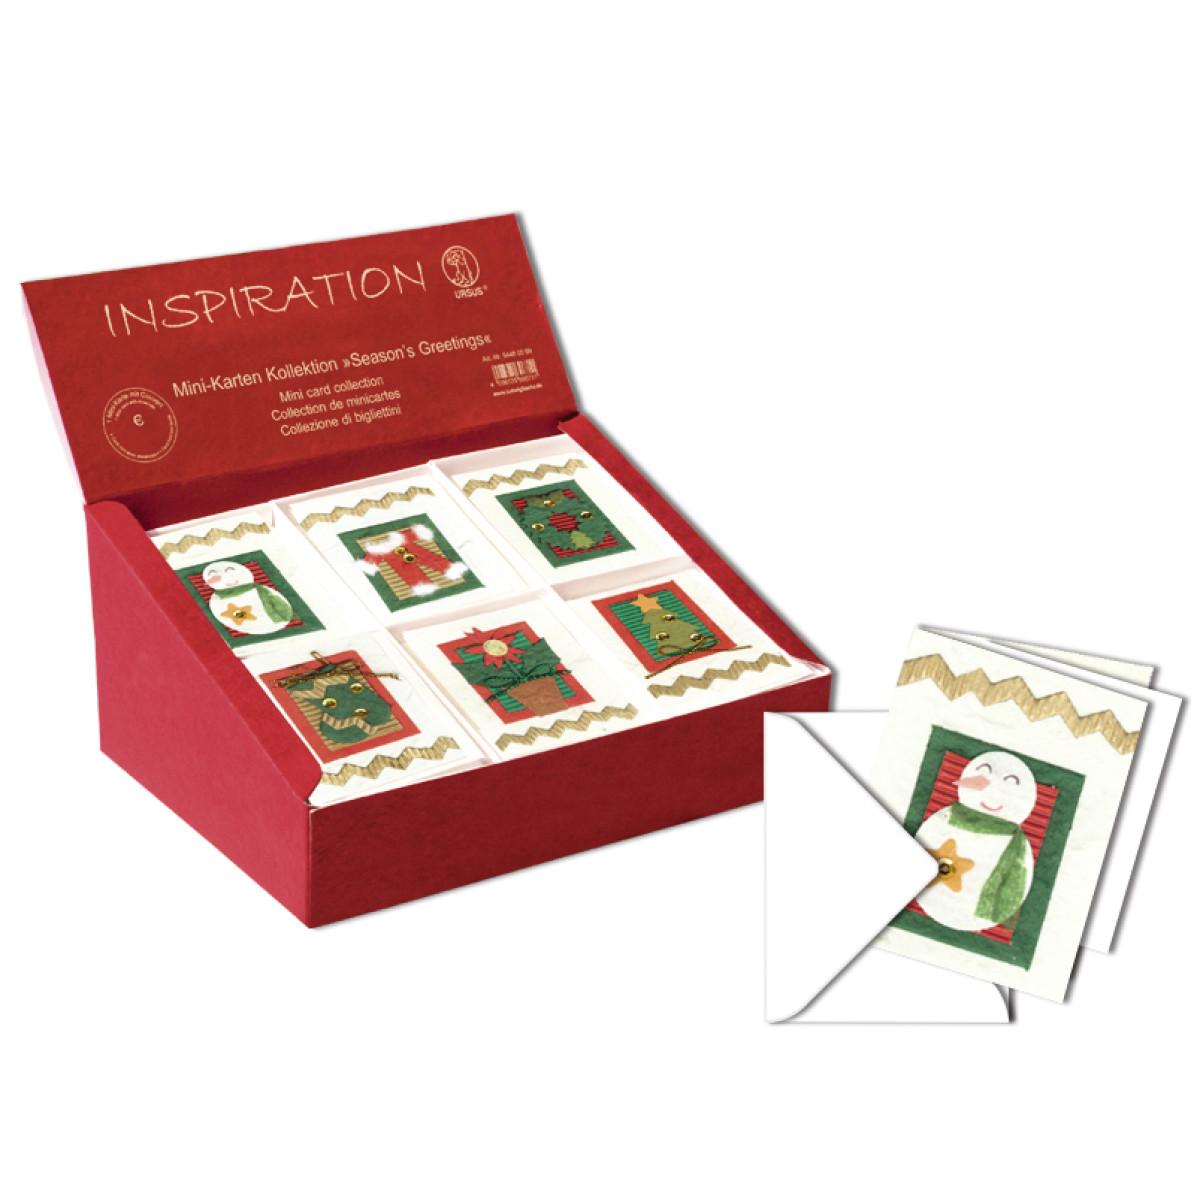 "Mini-Karten Kollektion ""Season's Greetings"""